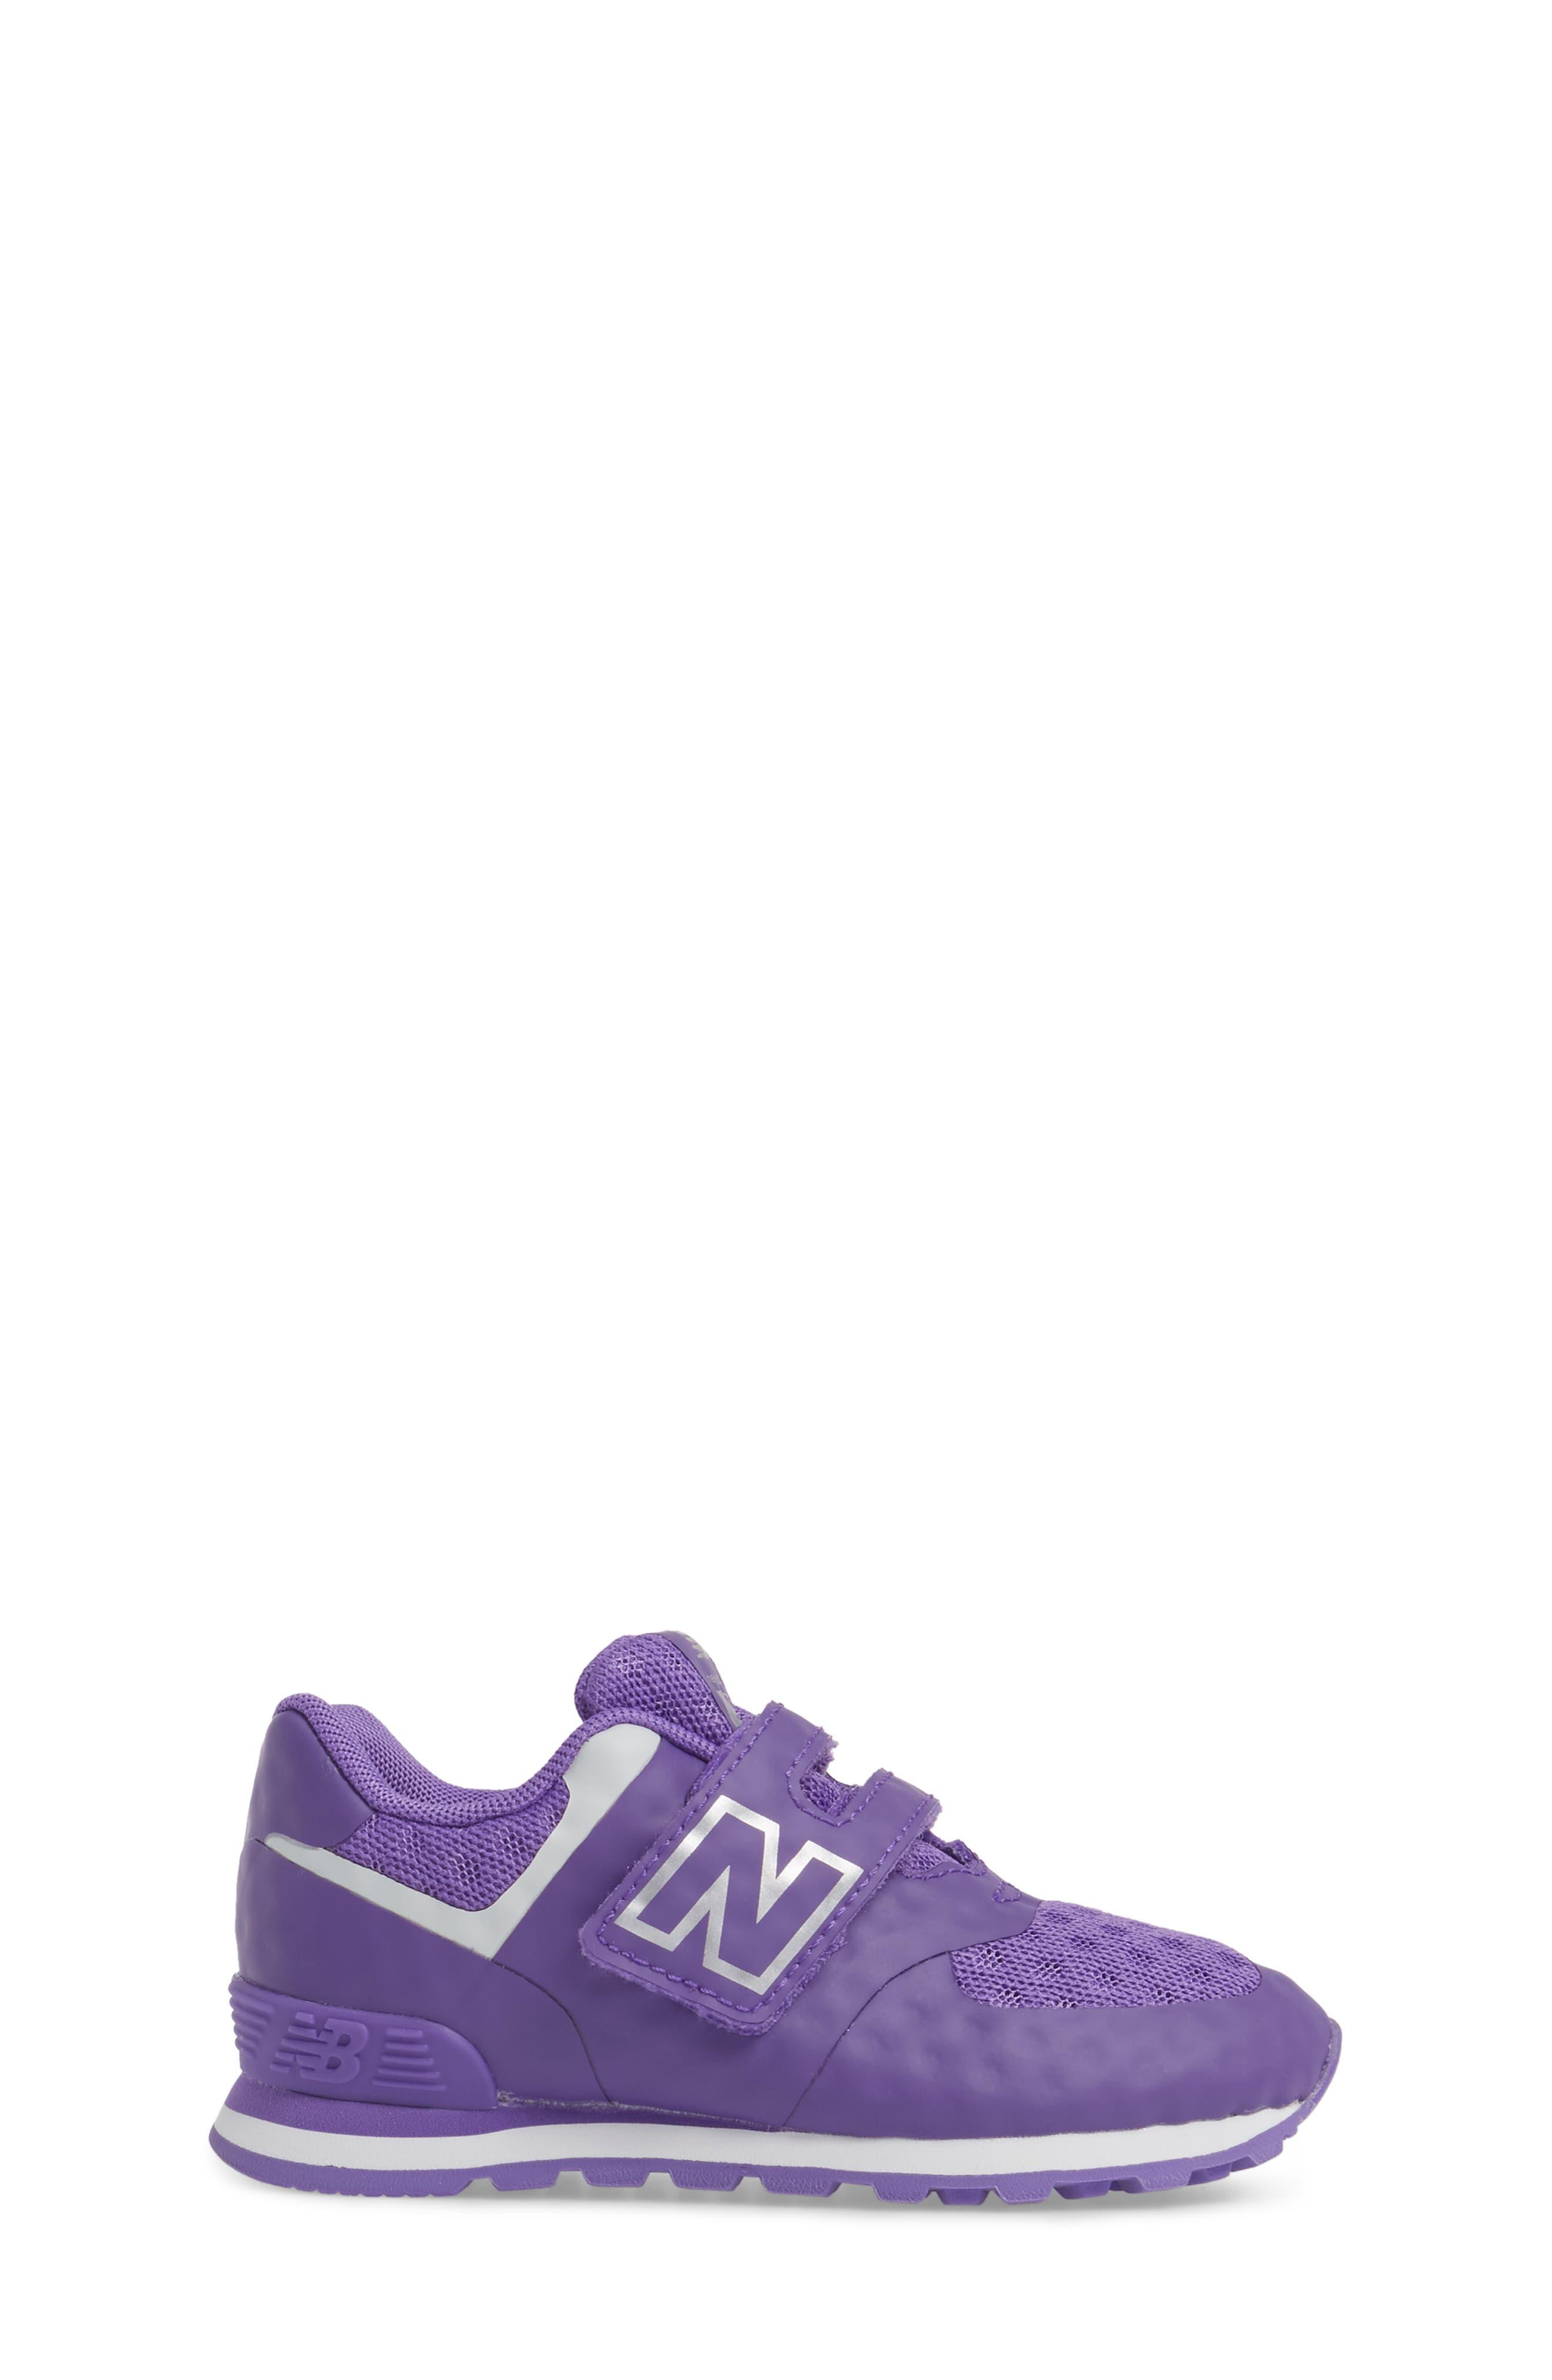 Alternate Image 3  - New Balance 574 Sneaker (Baby, Walker, Toddler, Little Kid & Big Kid)